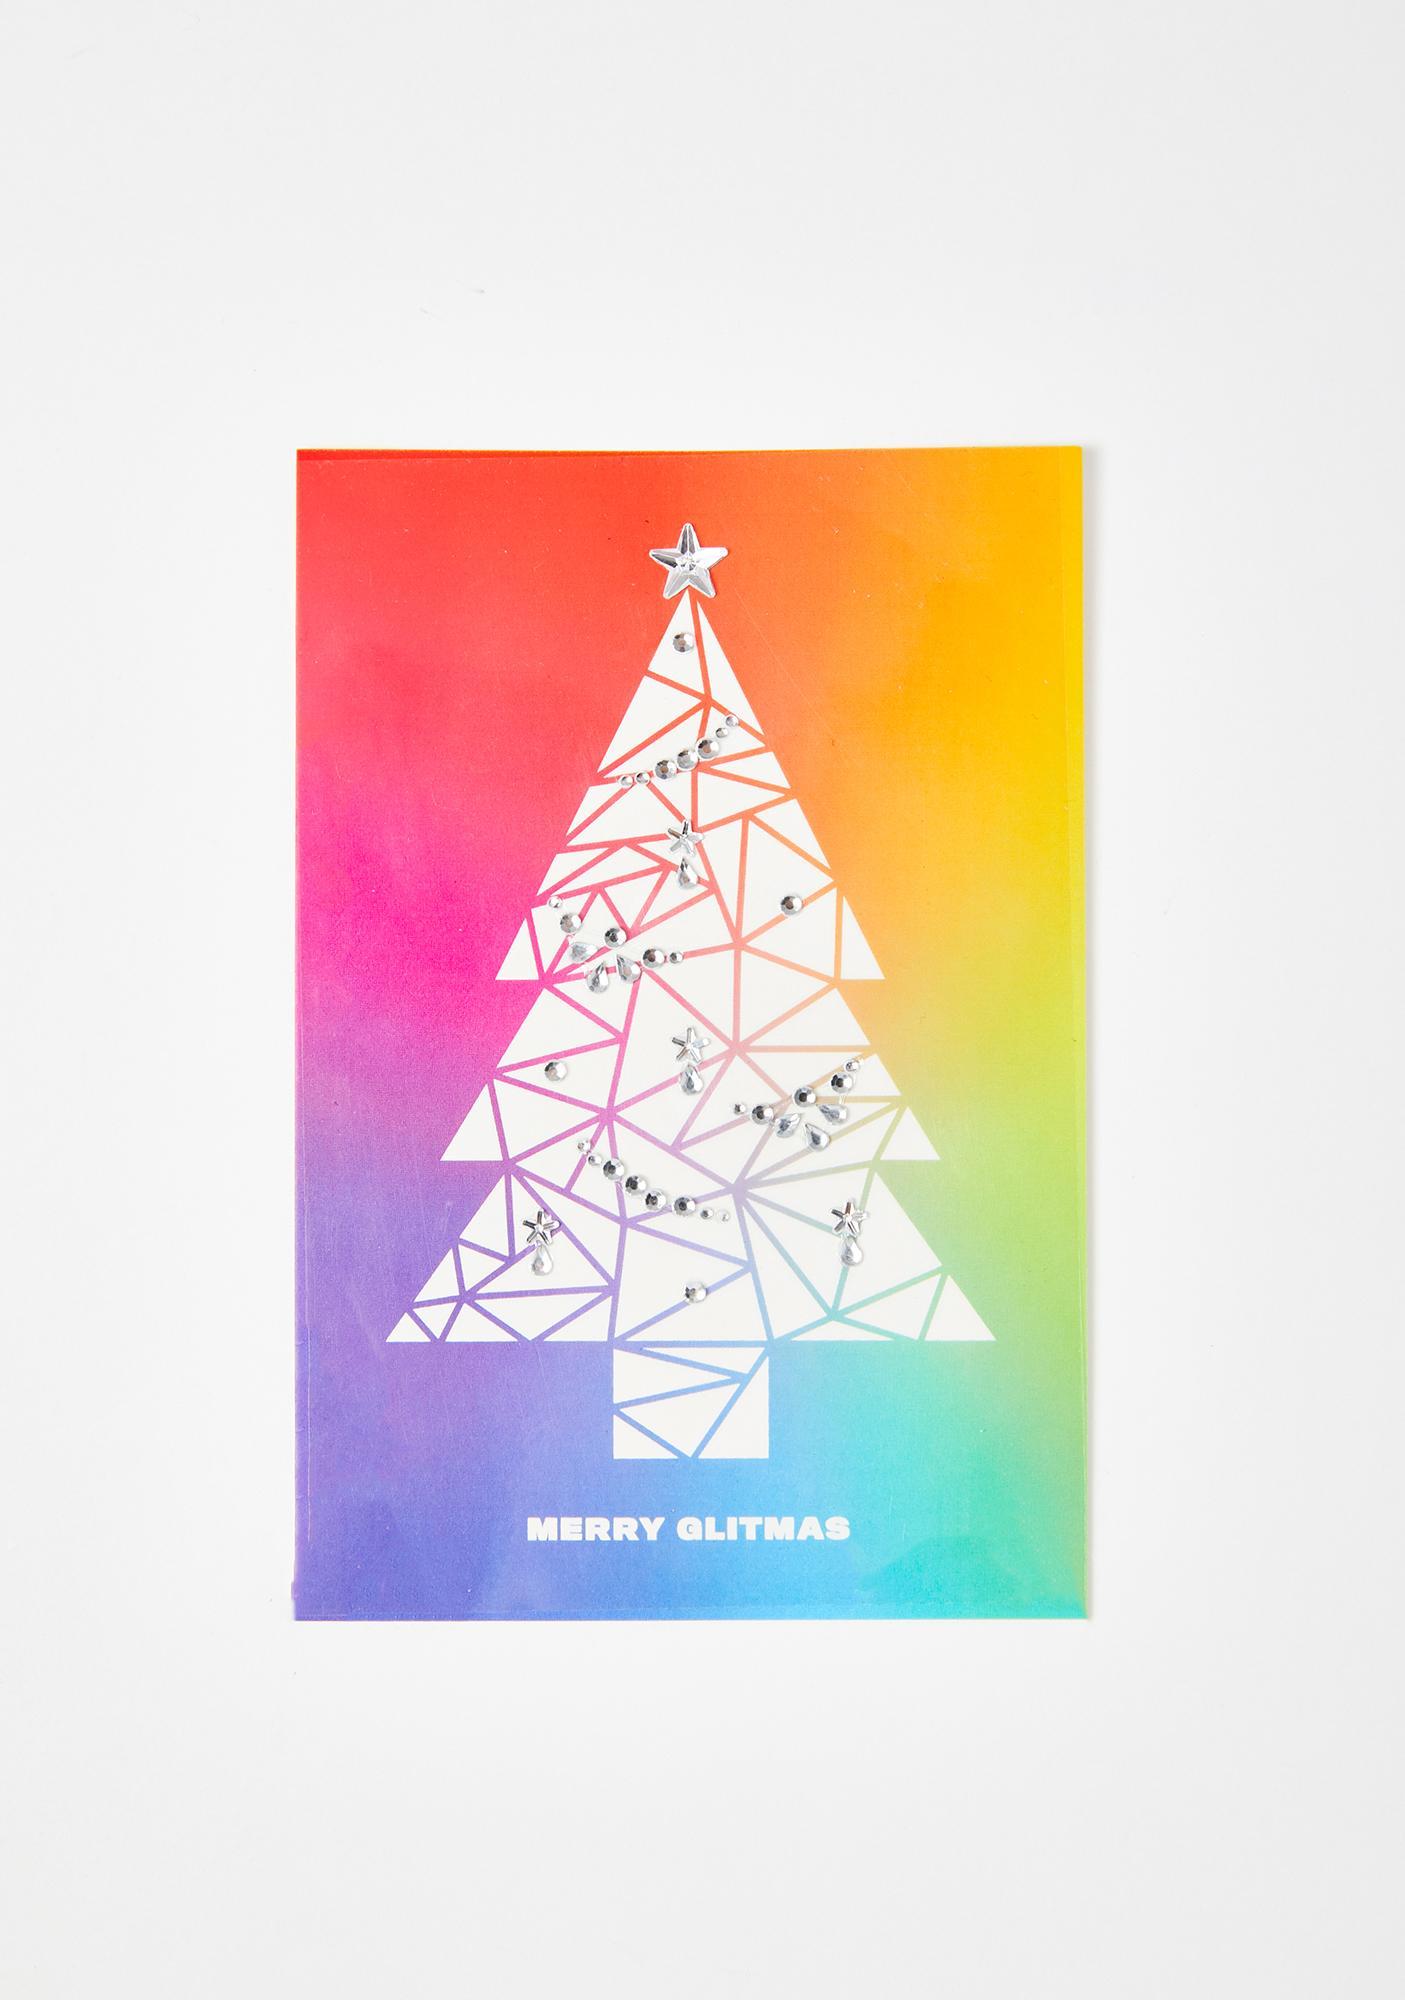 Lunautics Merry Glitmas Holiday Card & Face Jewels Mix Pack